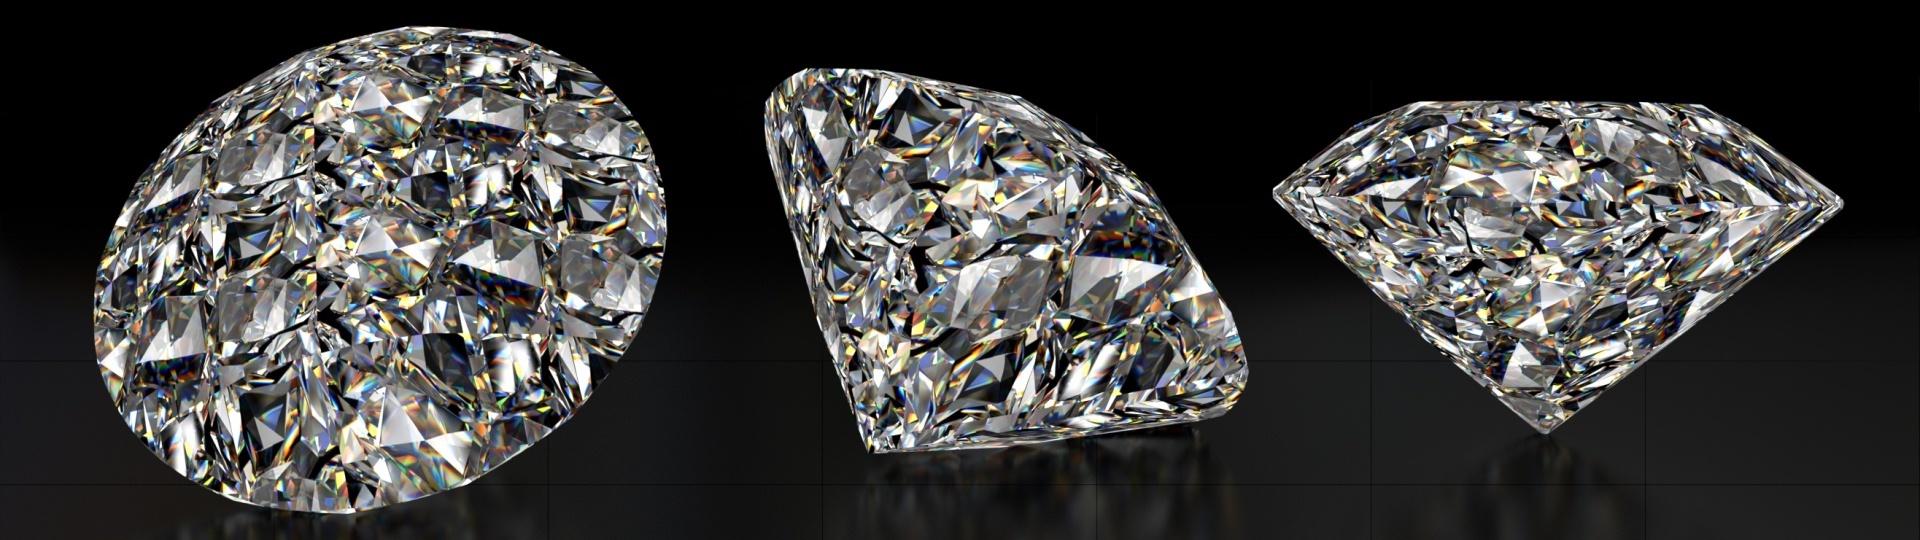 Diamonds on Home Page